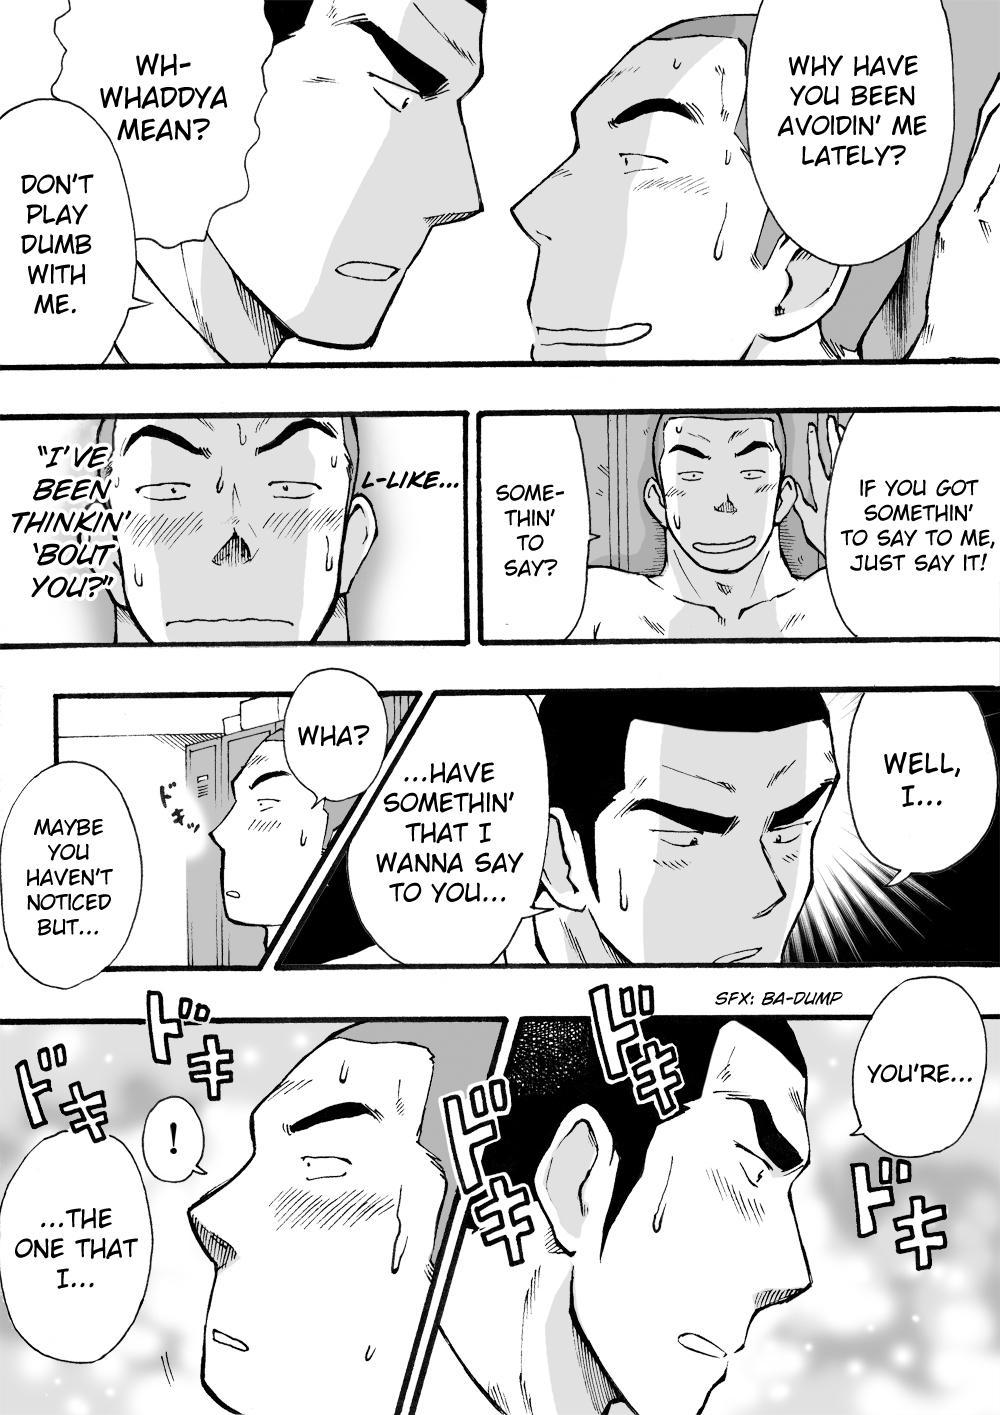 [Akahachi] Motemote Yakyuubu Otoko [Kouhen] | Popular Baseball Club Boys (Part Two) [English] [Papatez] 12